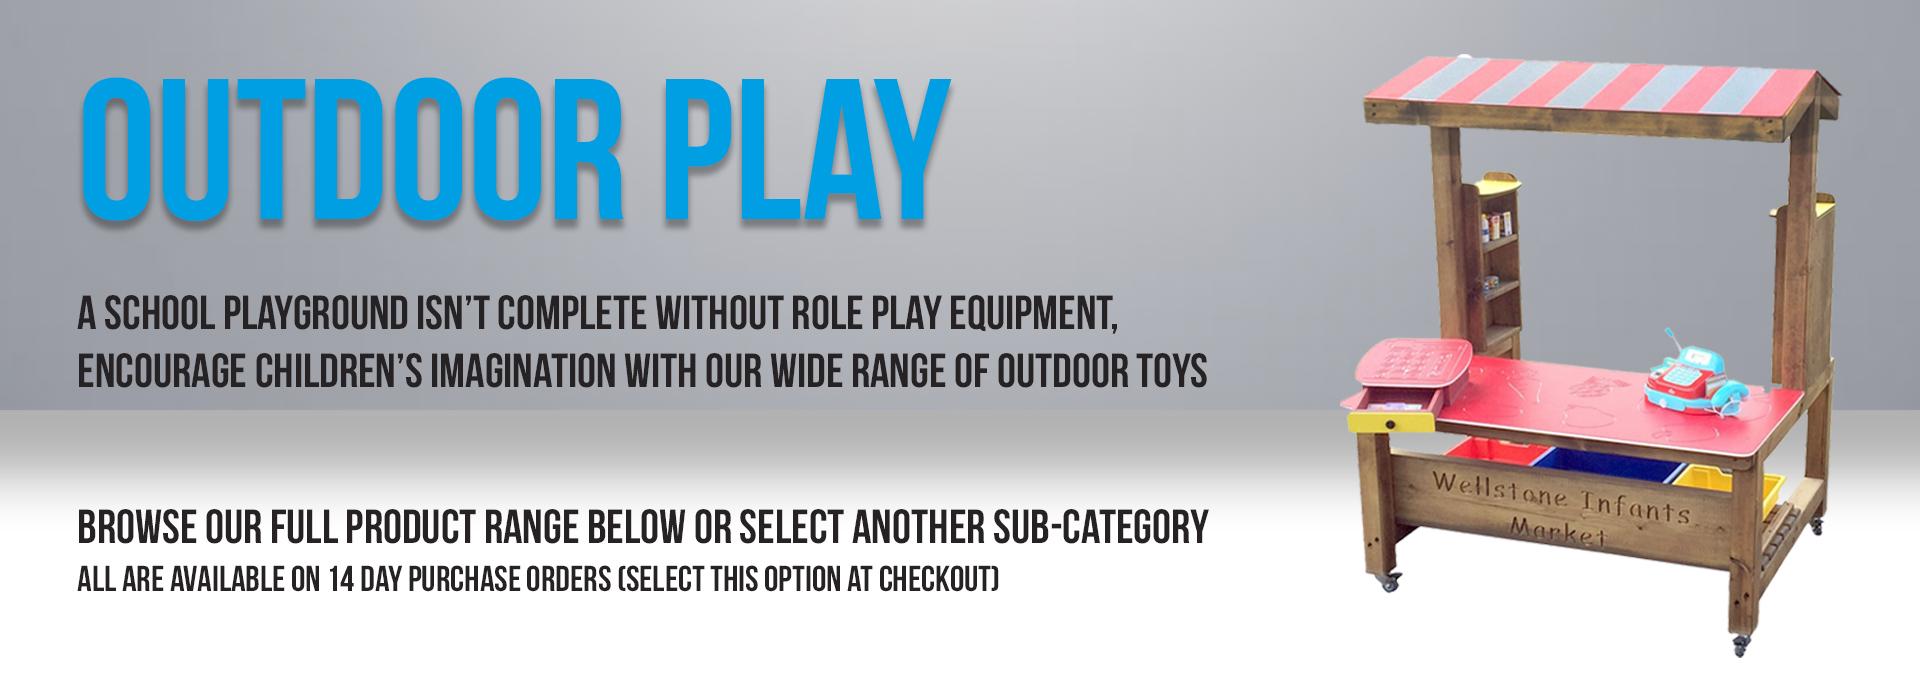 outdoor-play-banner.jpg